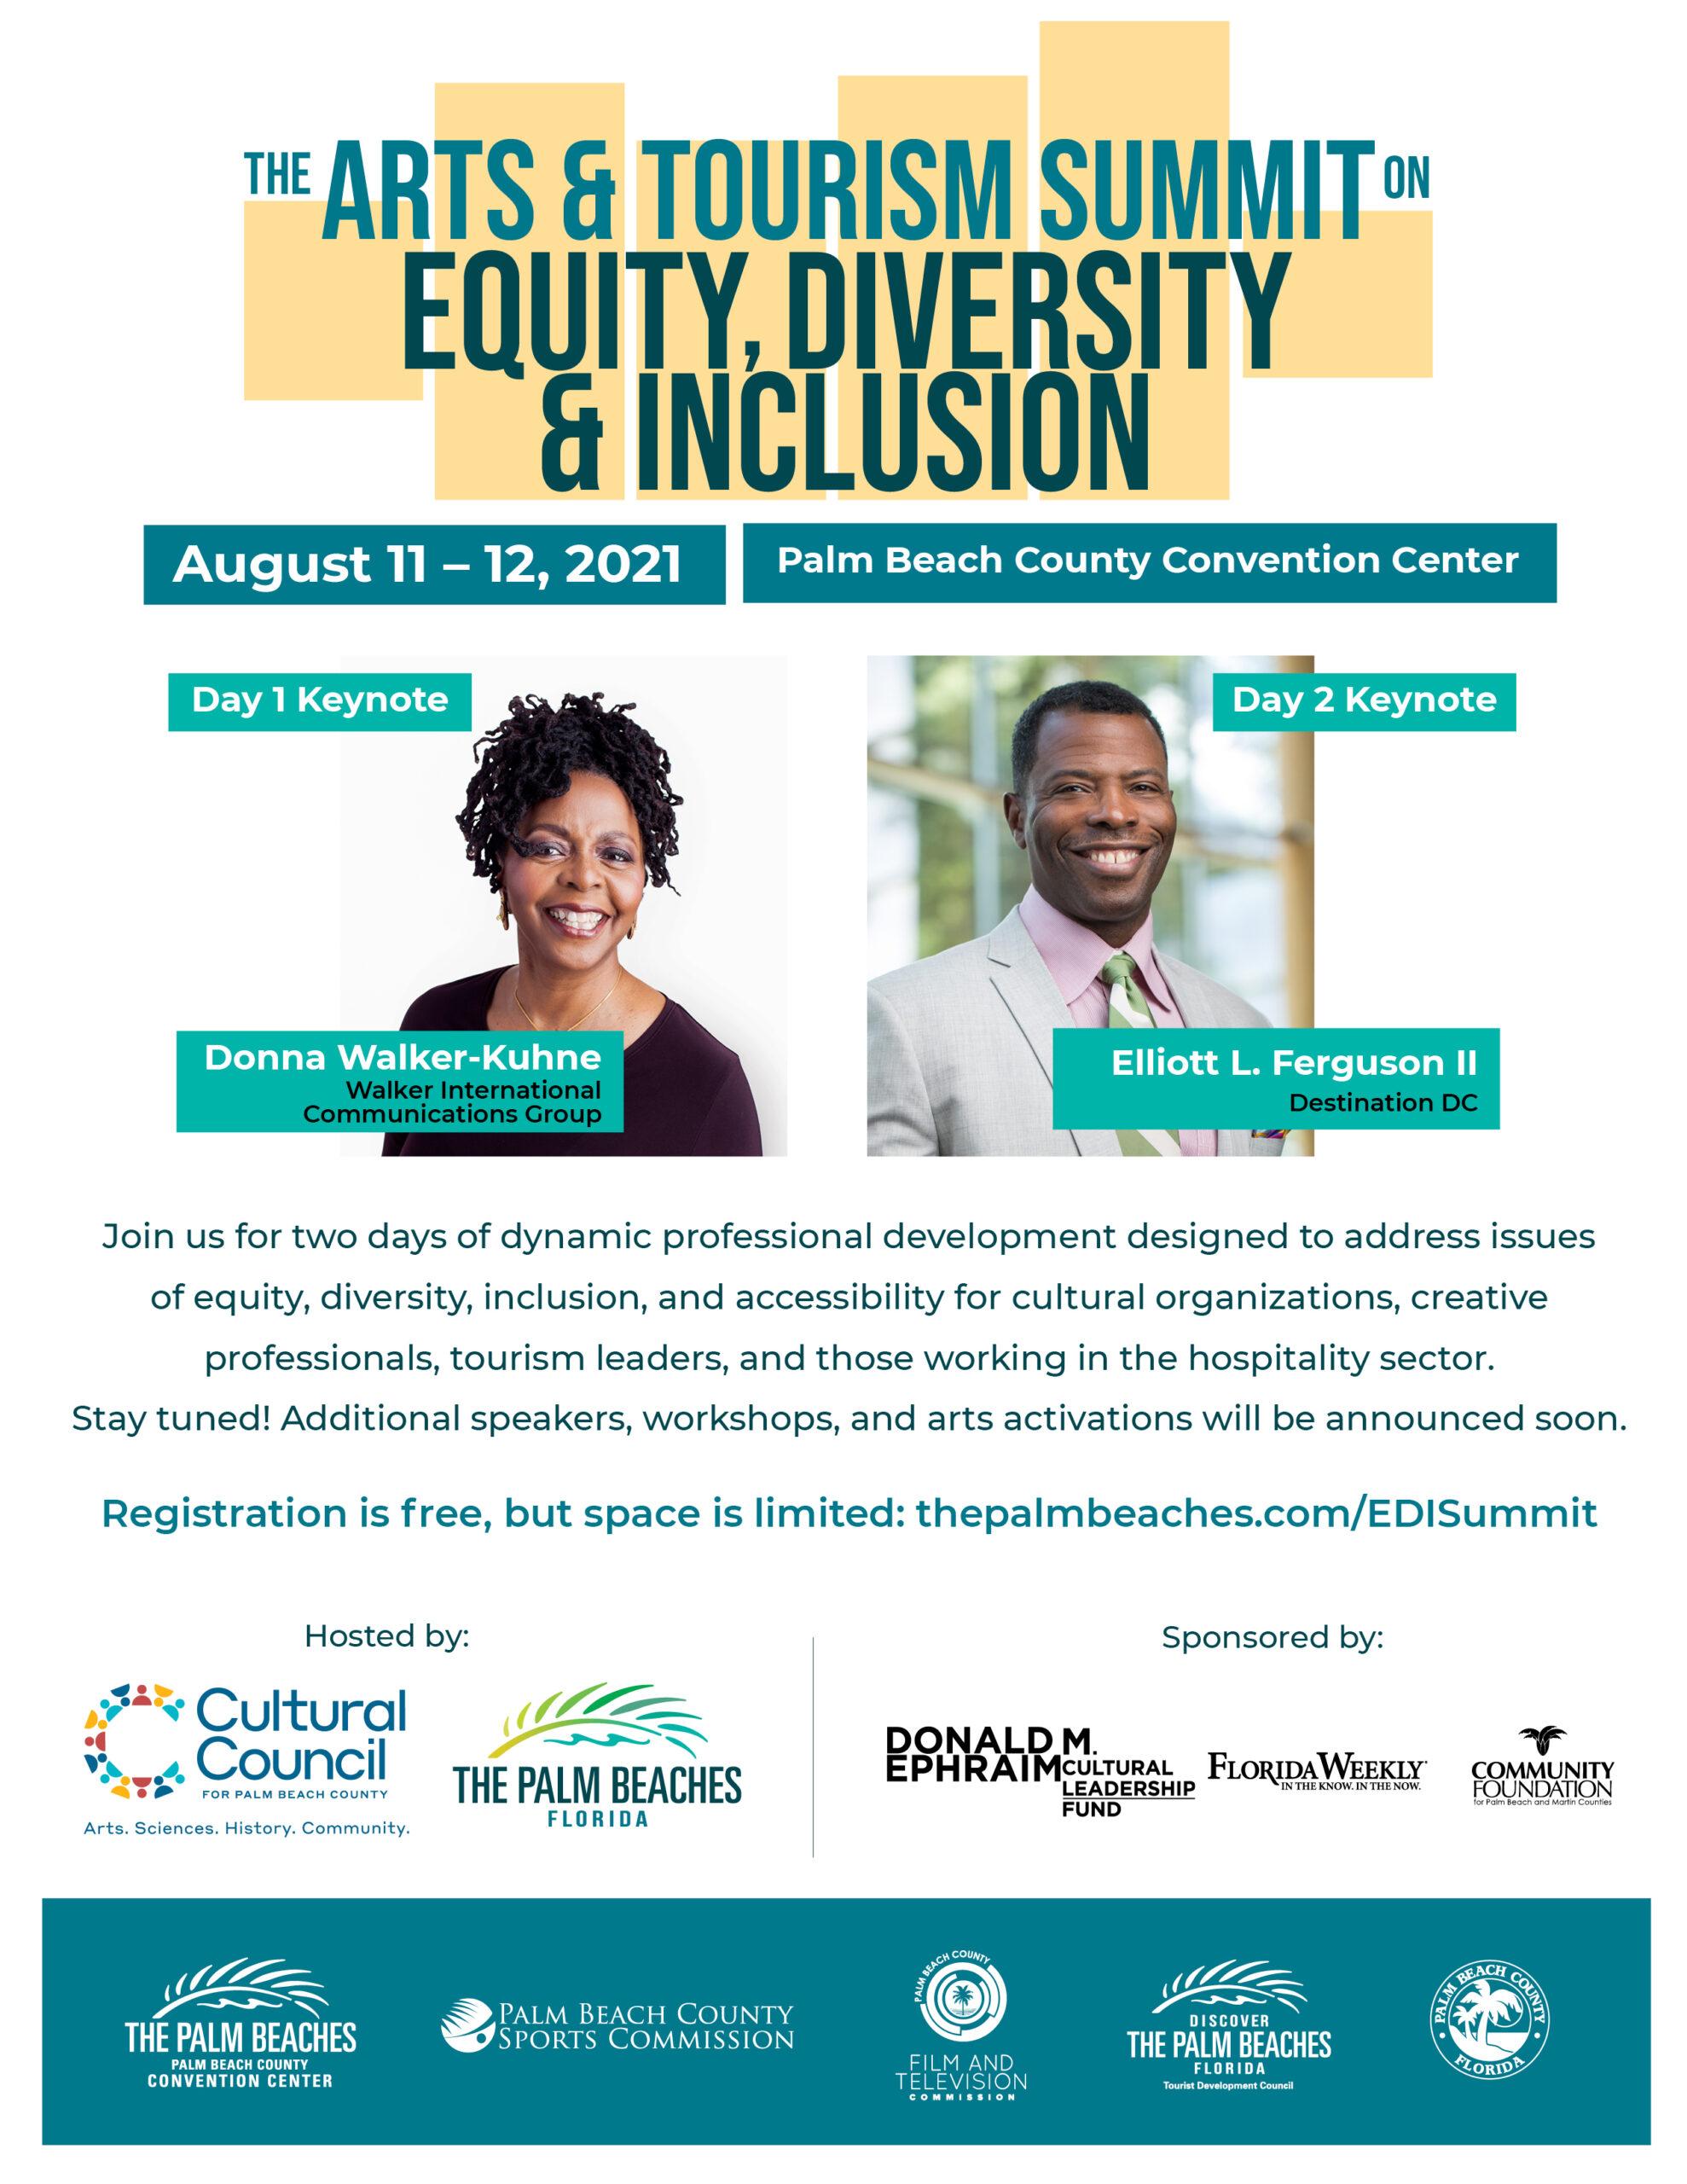 Arts & Tourism Equity Diversity & Inclusion Summit